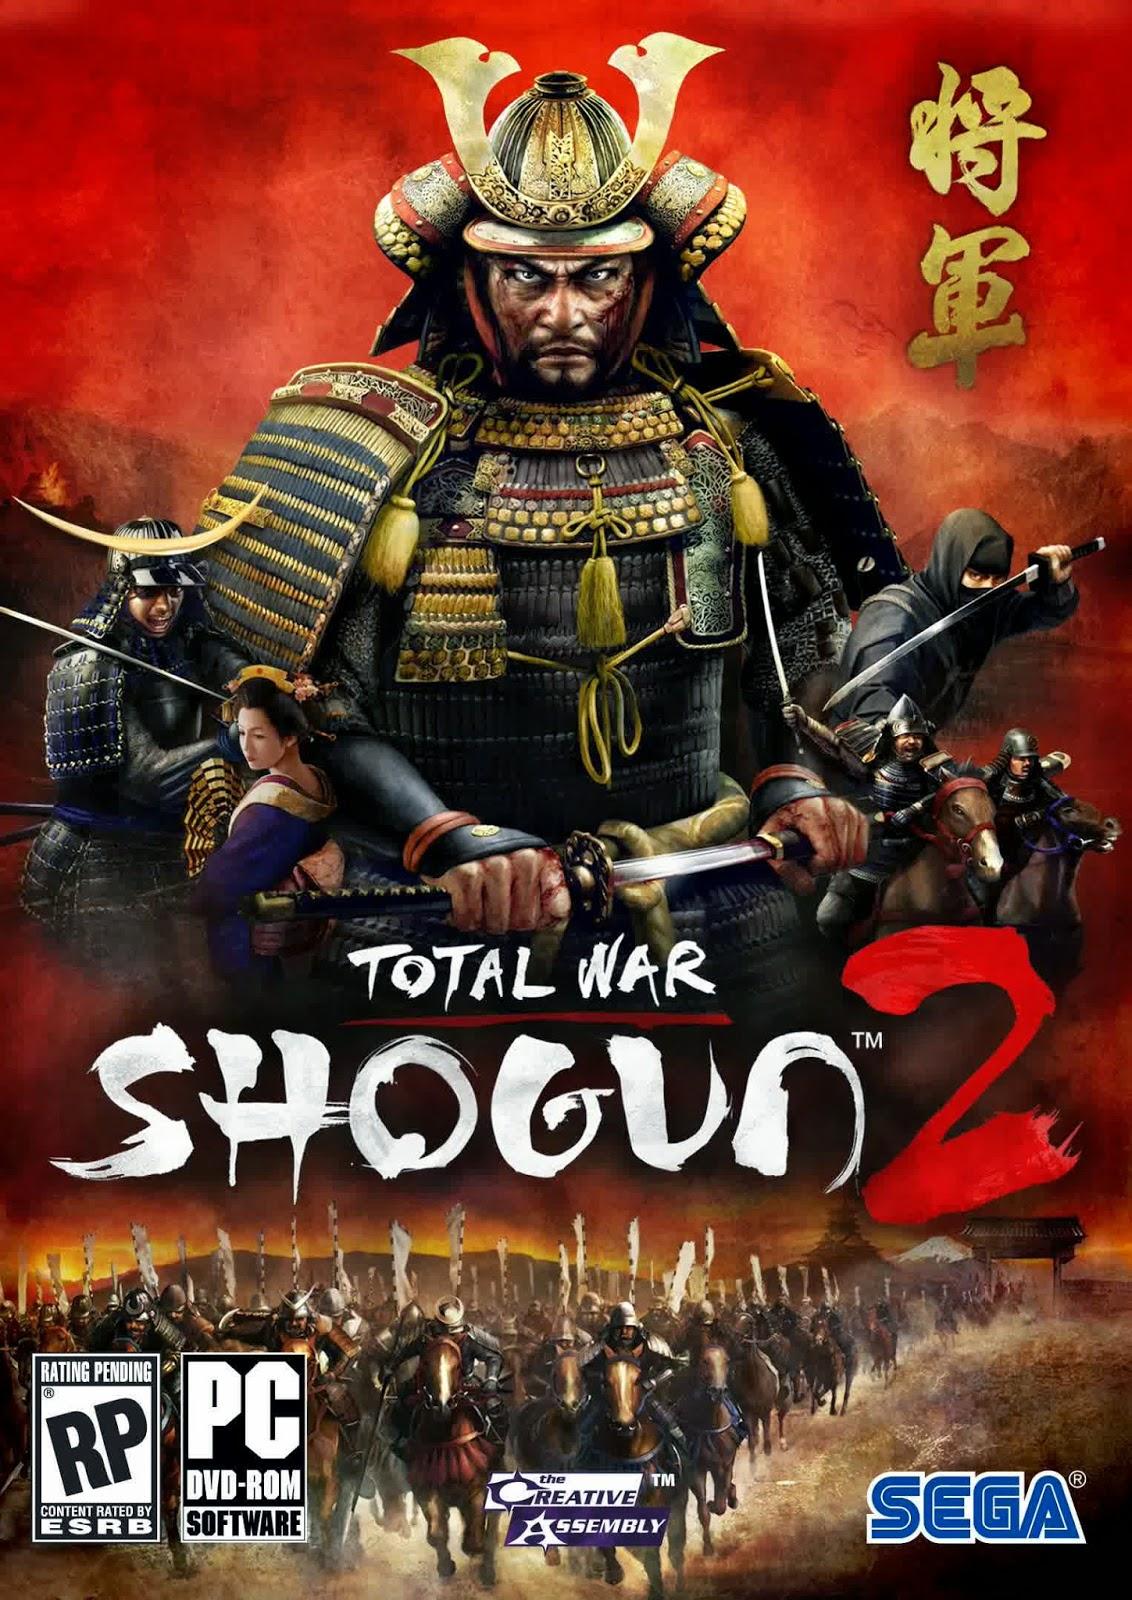 Total War SHOGUN 2 Full Game